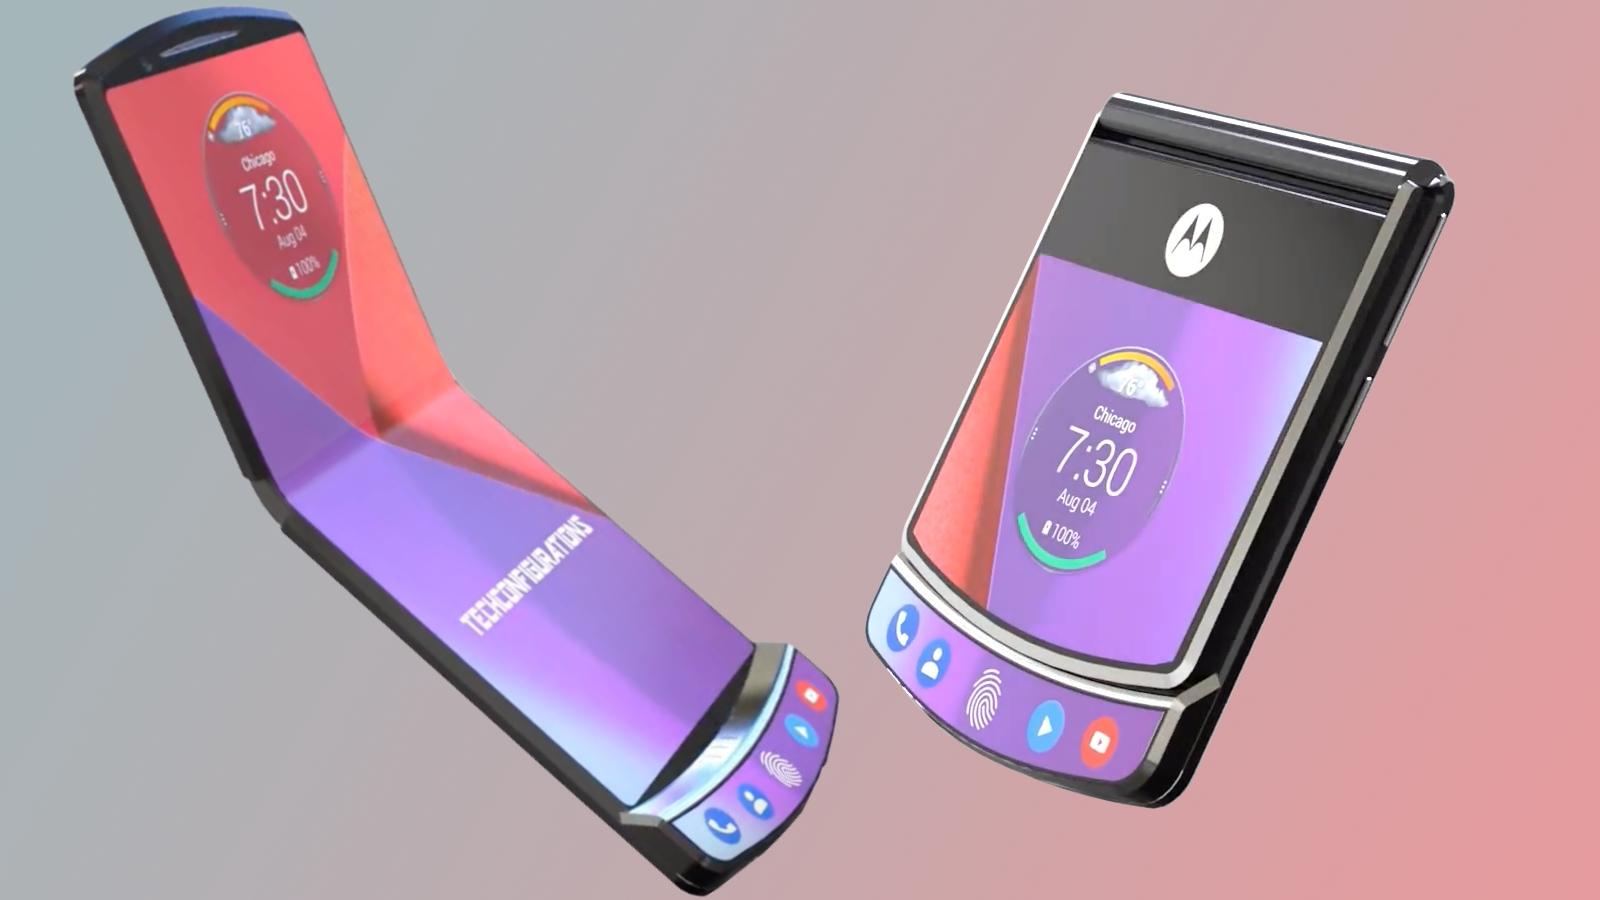 Xiaomi запатентовала гибкий смартфон-раскладушку, похожий на Motorola Razr